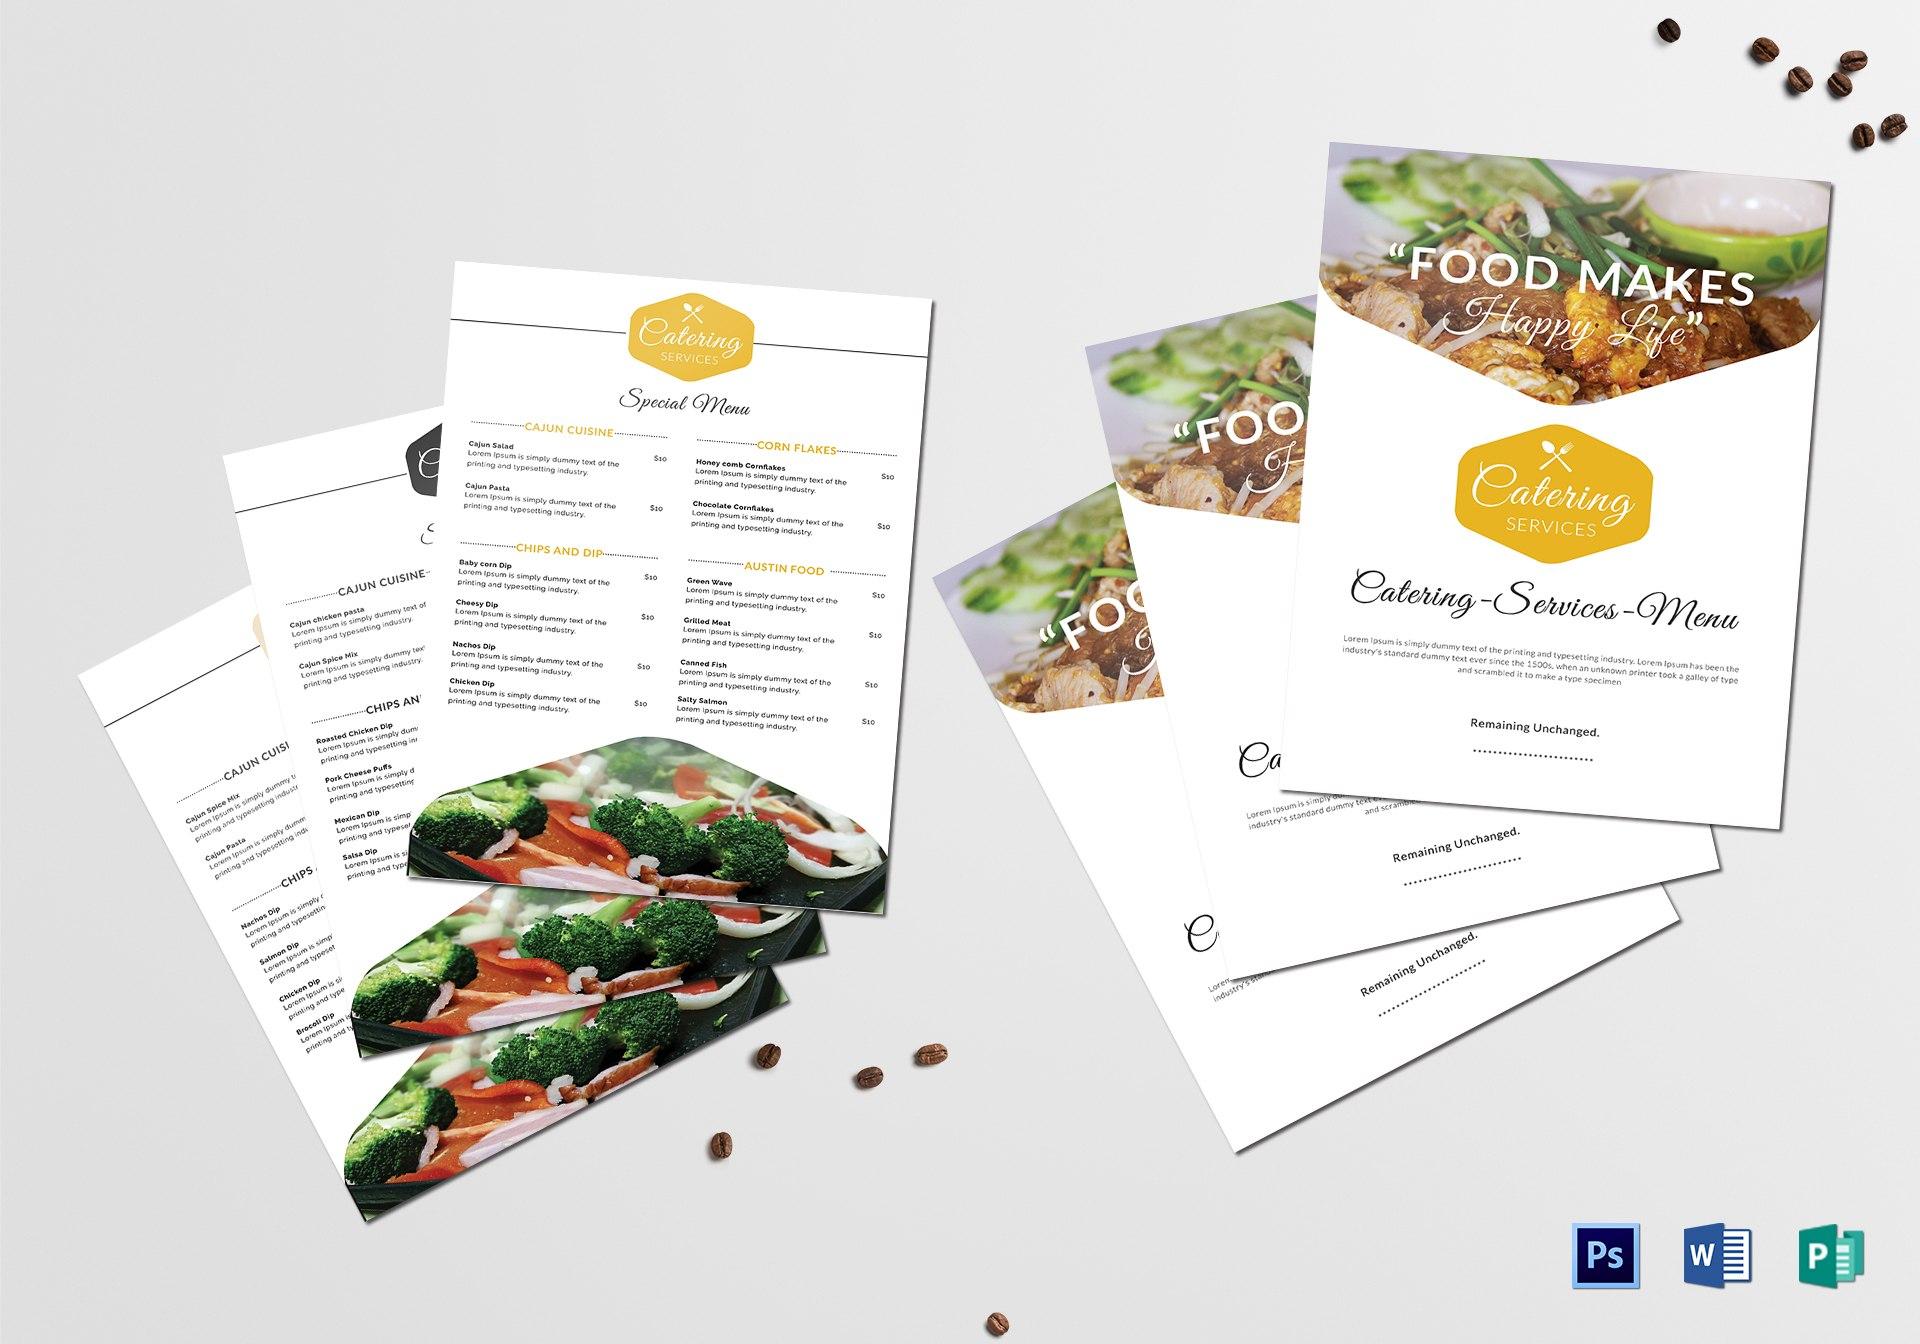 Food Catering Service Menu Template In Product Menu Template